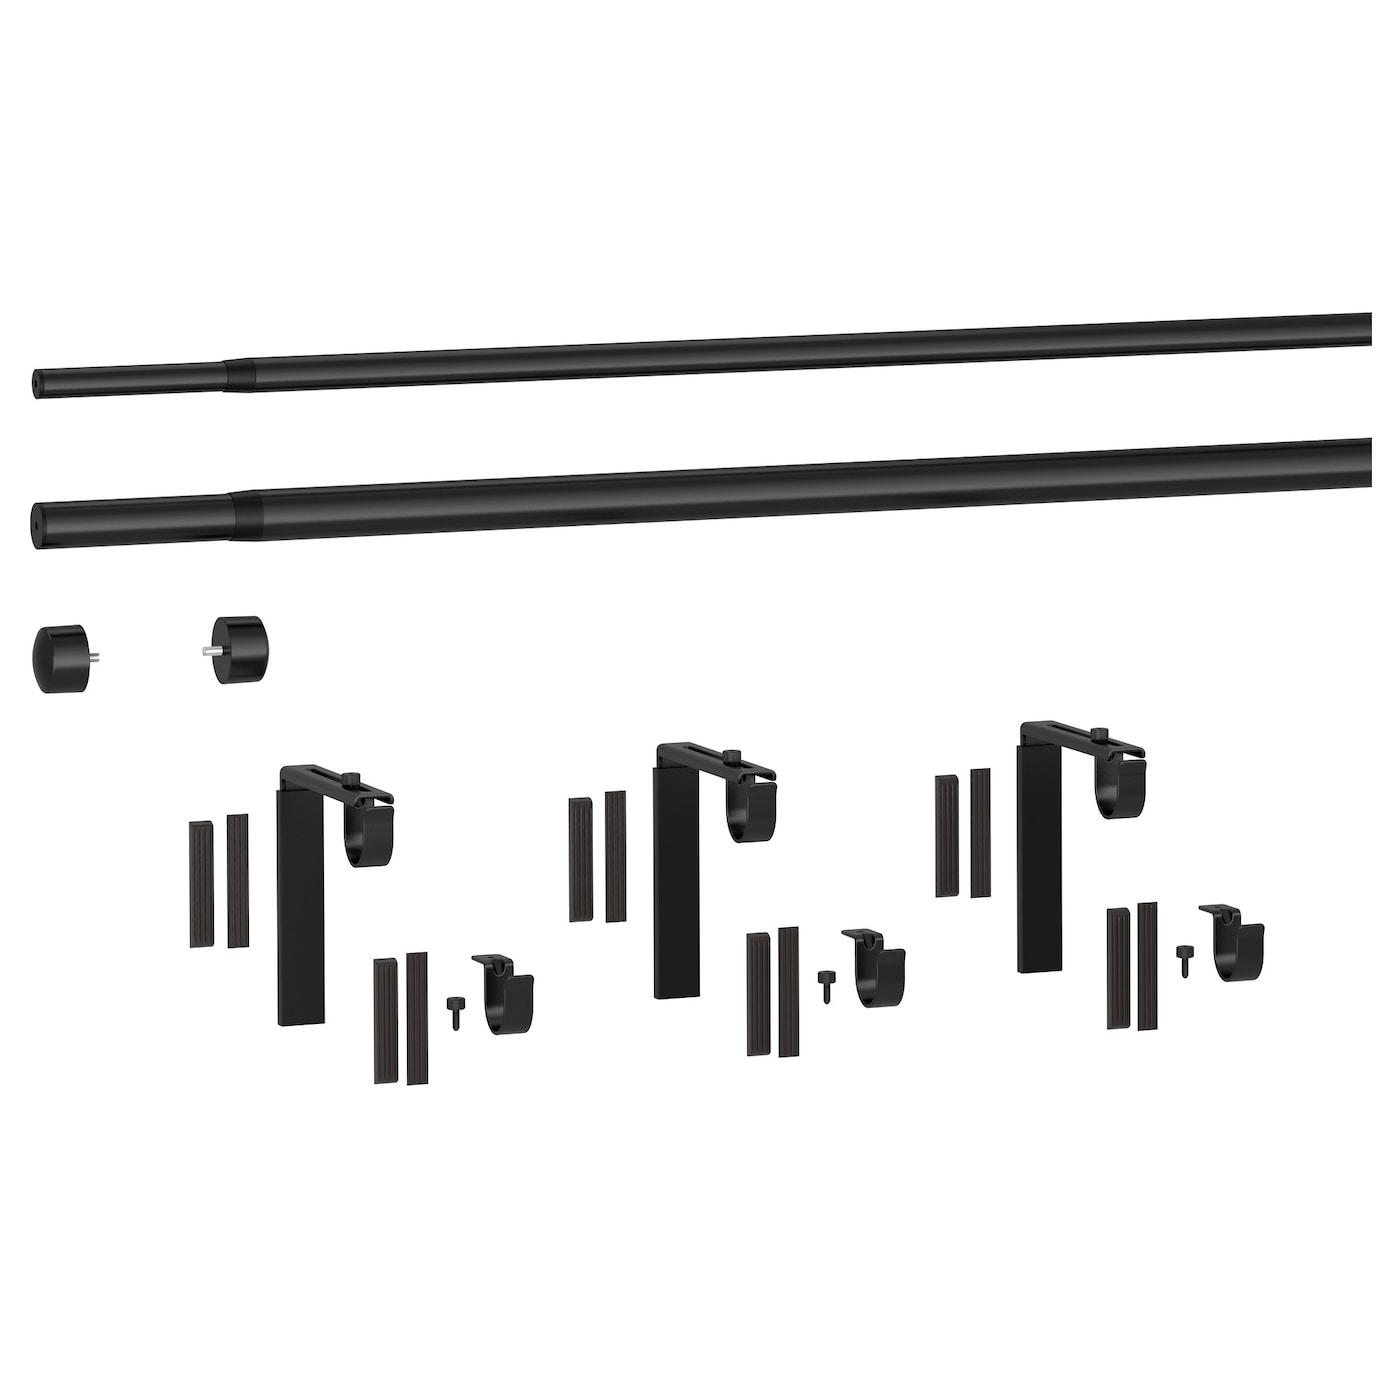 ikea hugadrcka double curtain rod combination the length is adjustable